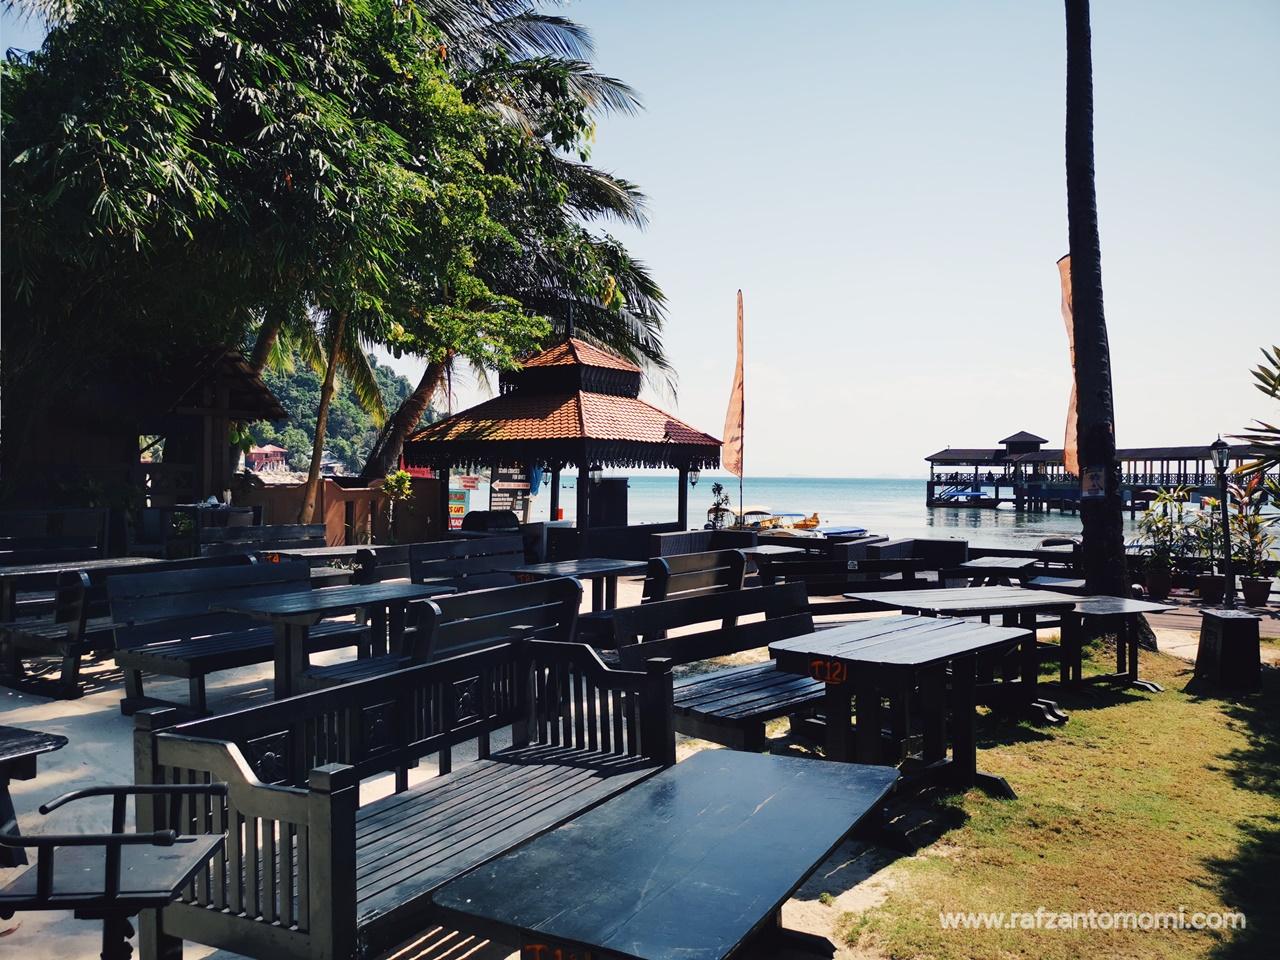 Ombak Cafe, Pulau Perhentian